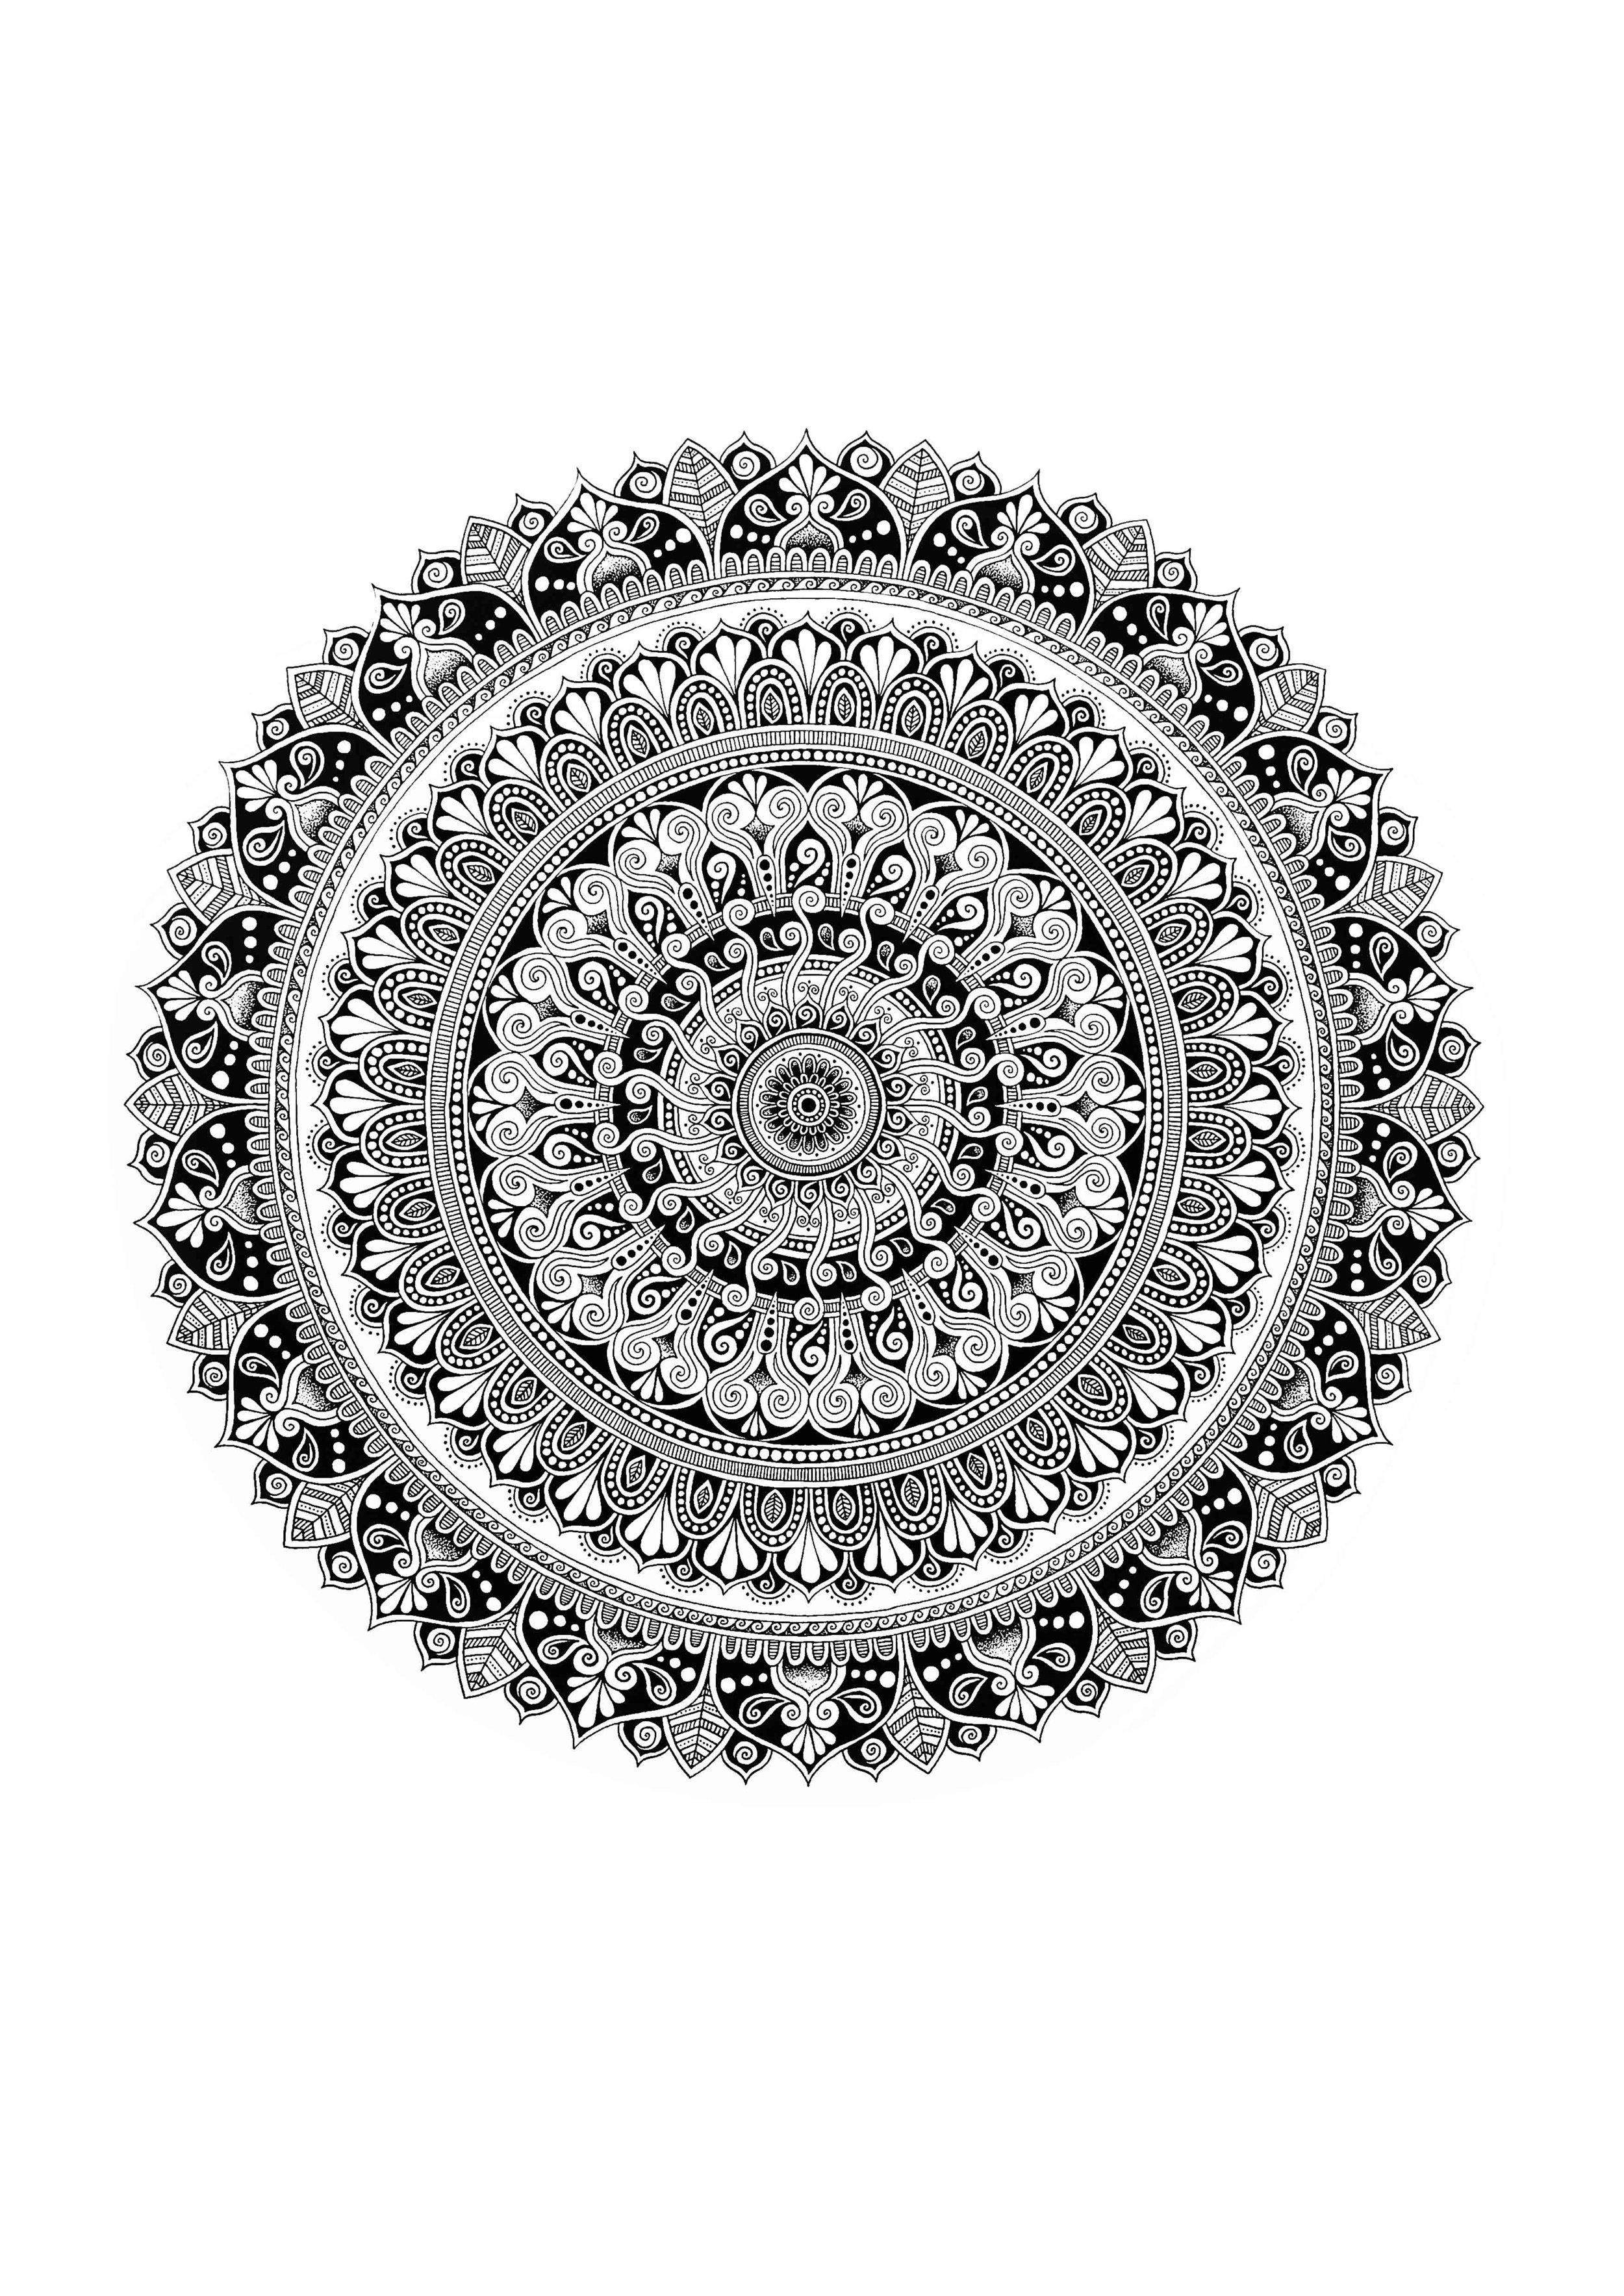 The Colliding Stars Mandala.jpg